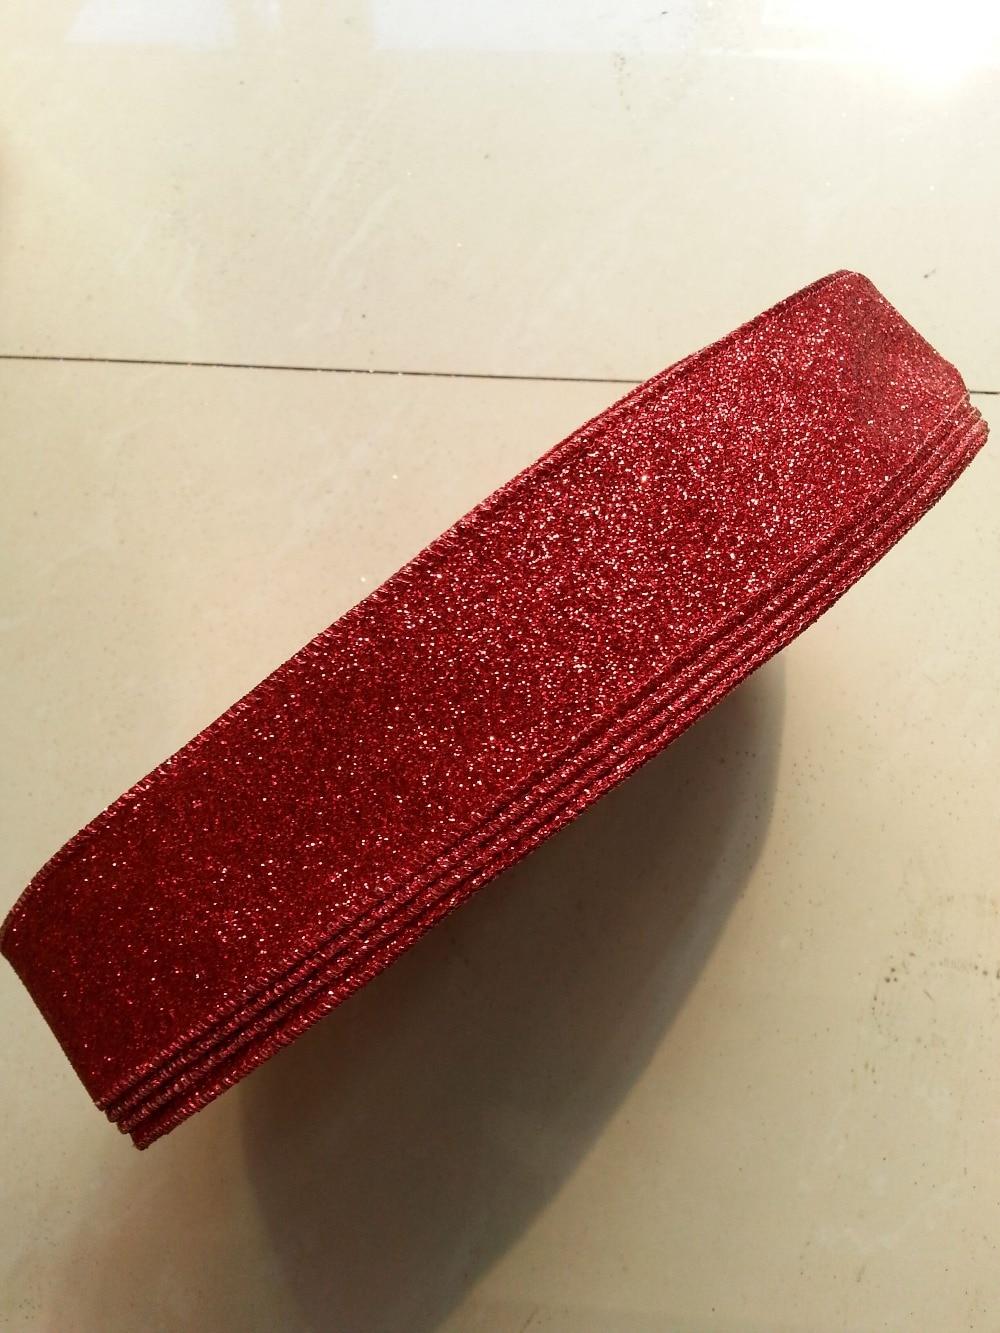 Gefrostete abalorios 8mm rojo bala 42stk mate Strange joyas bricolaje r92